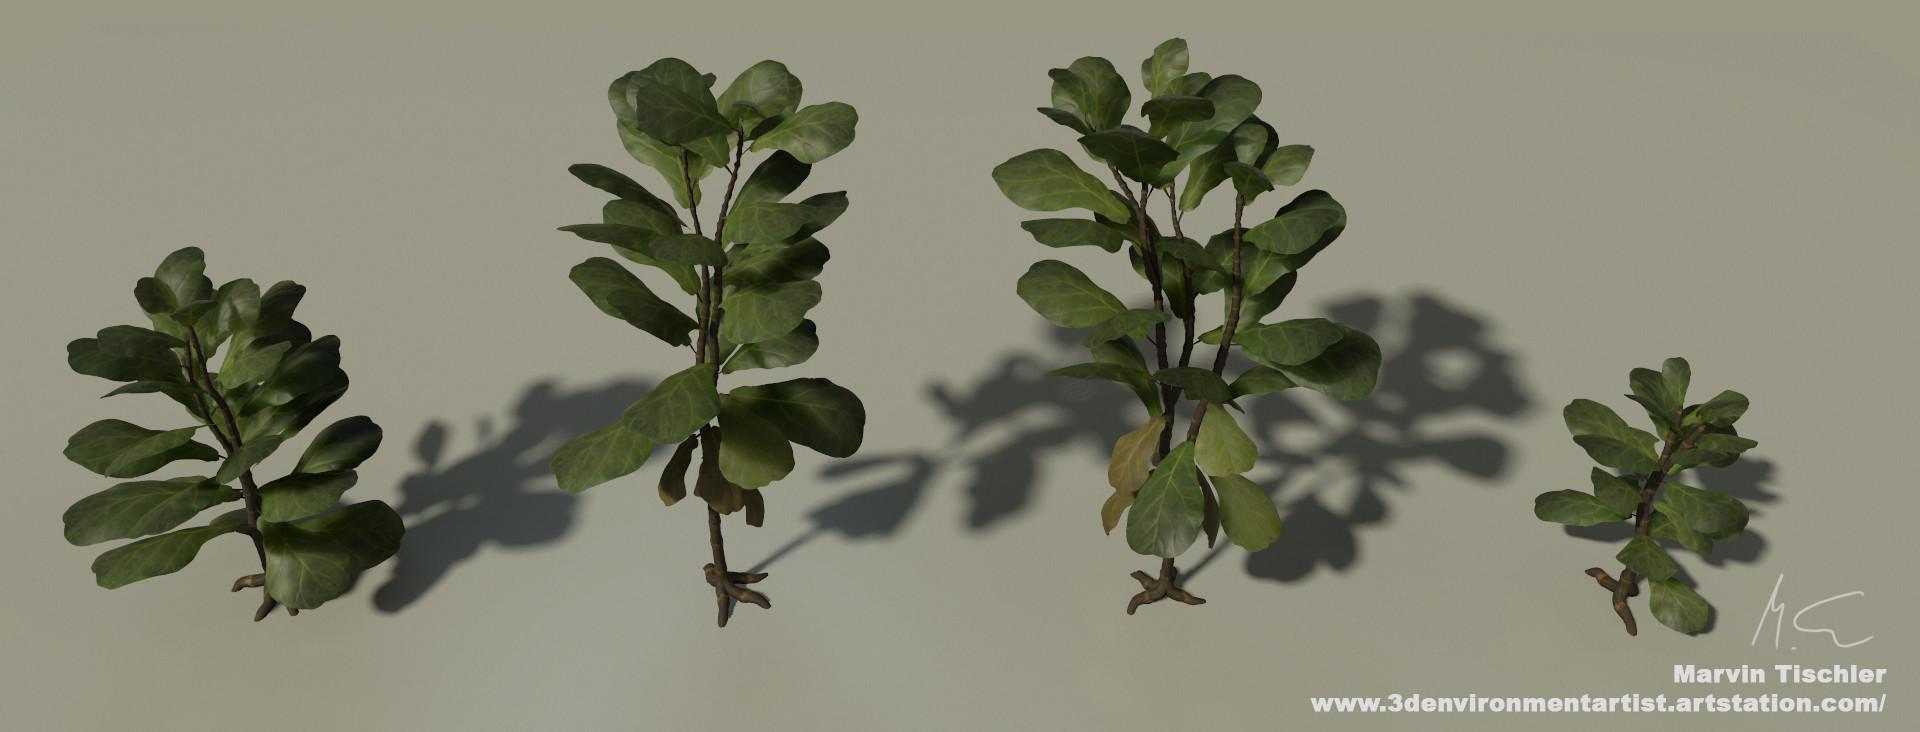 Marvin tischler plants 001 c